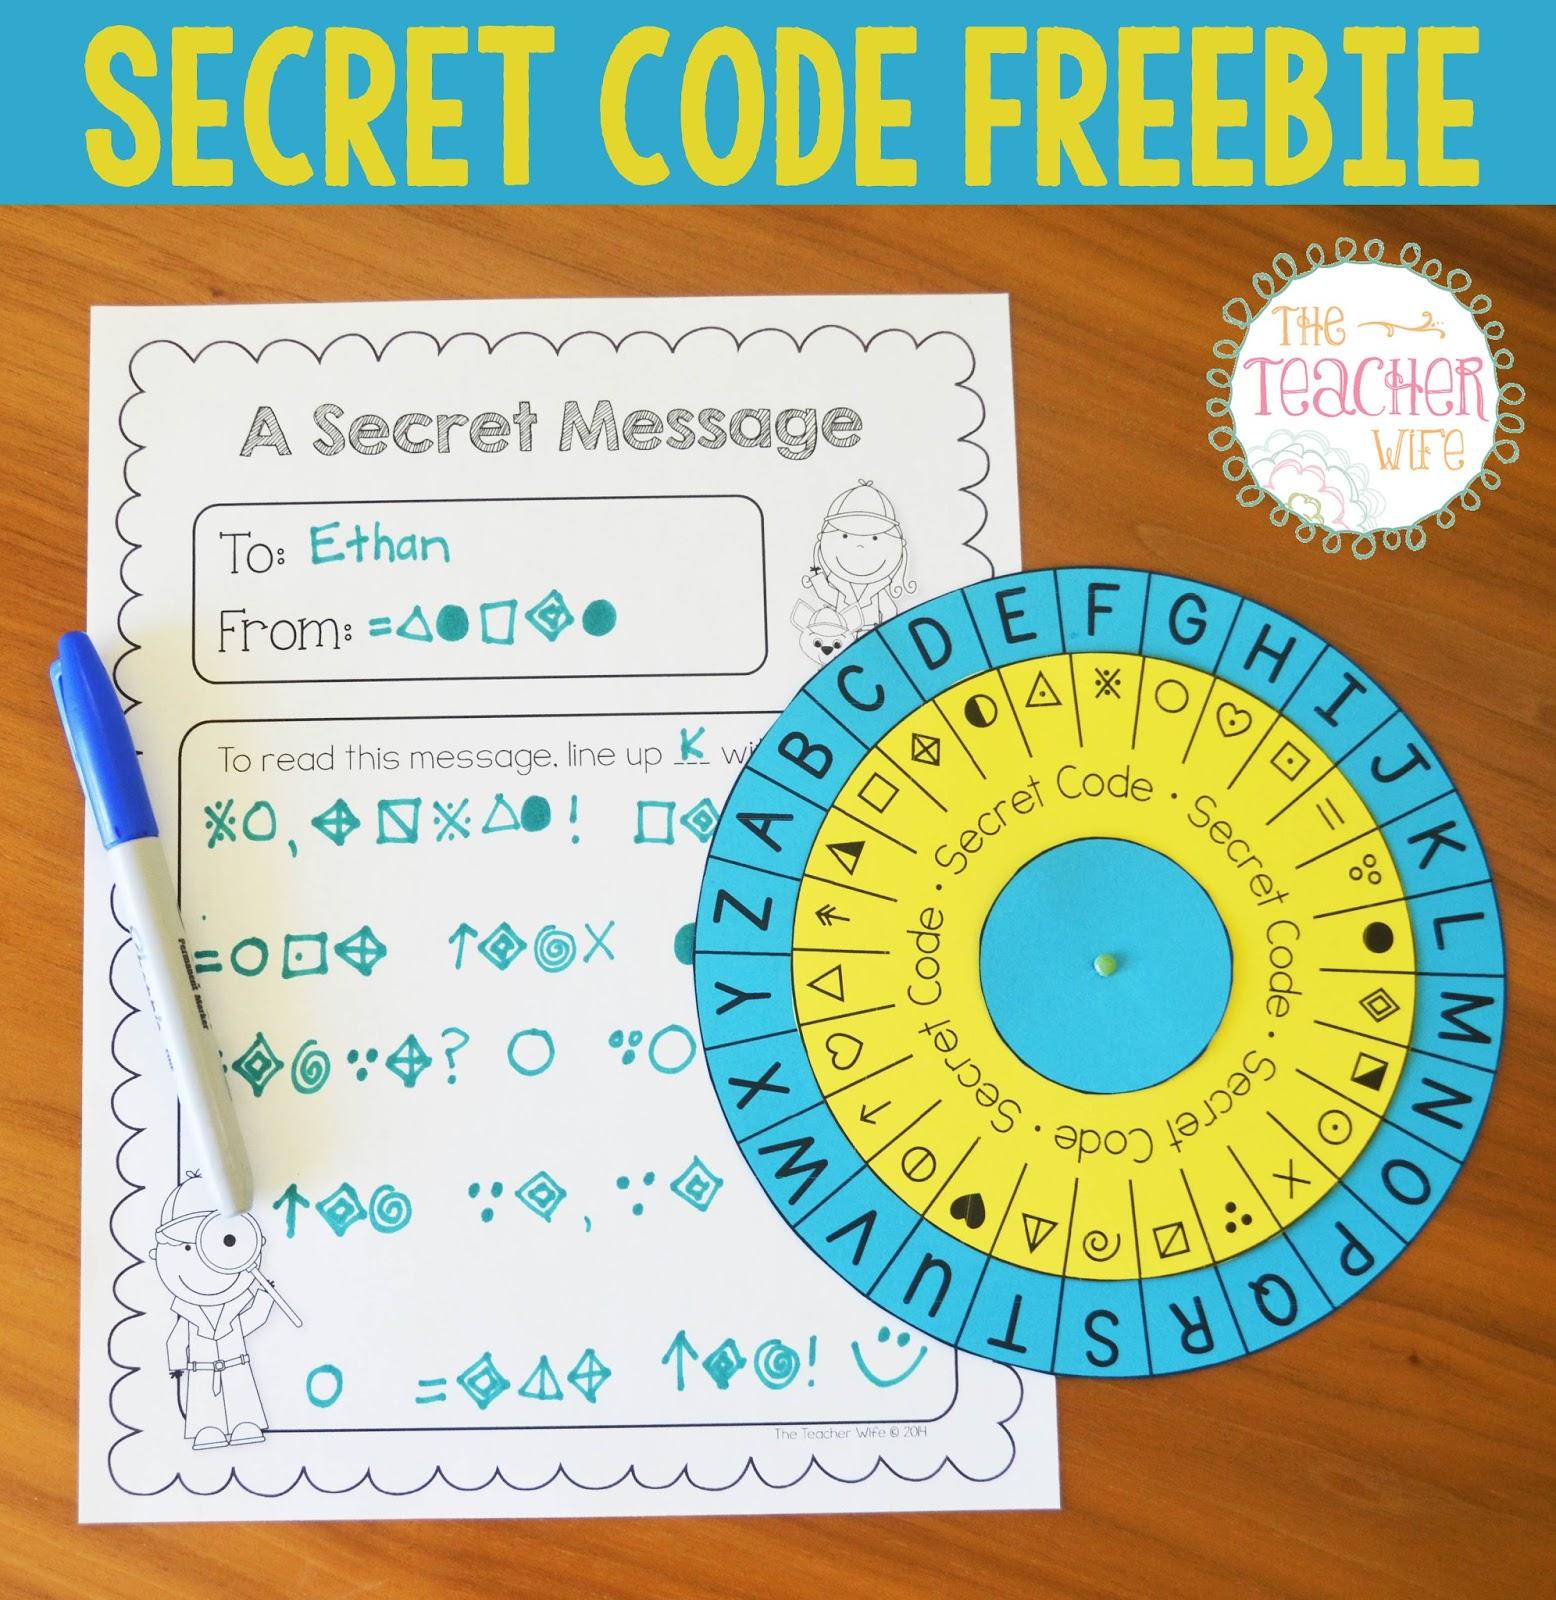 Secret Code Freebie | the teacher wife | Bloglovin\'